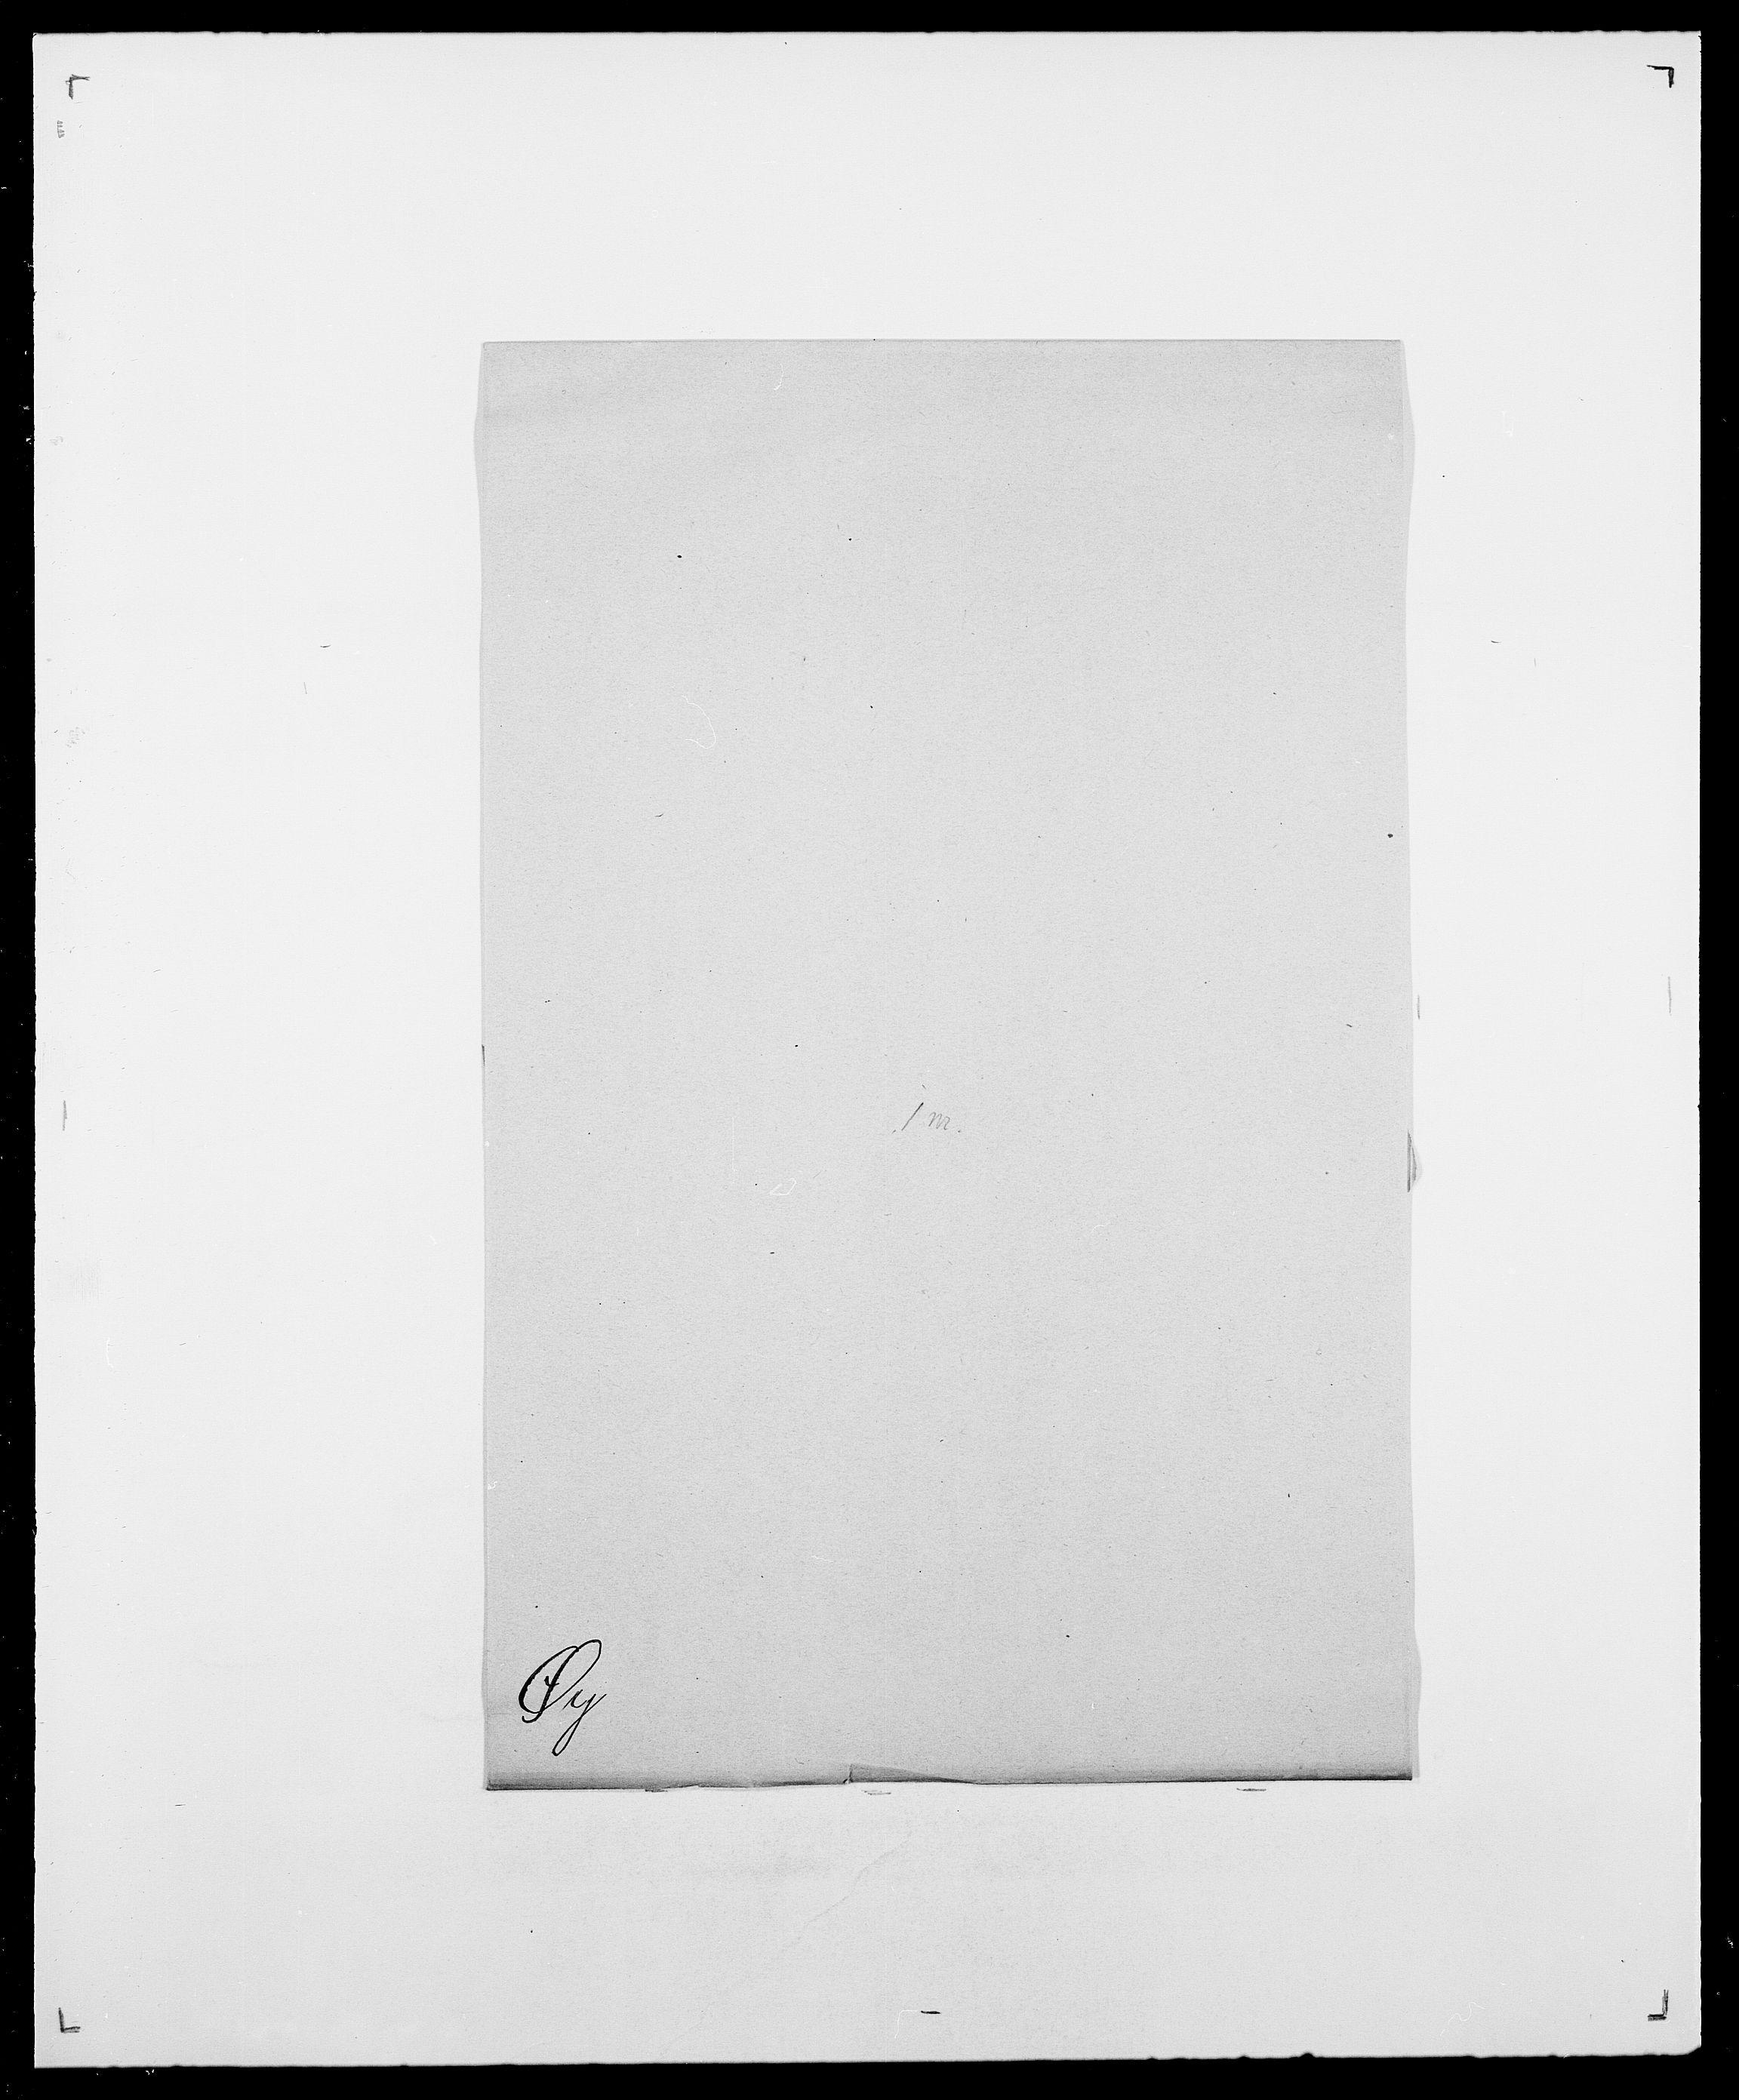 SAO, Delgobe, Charles Antoine - samling, D/Da/L0043: Wulfsberg - v. Zanten, s. 424